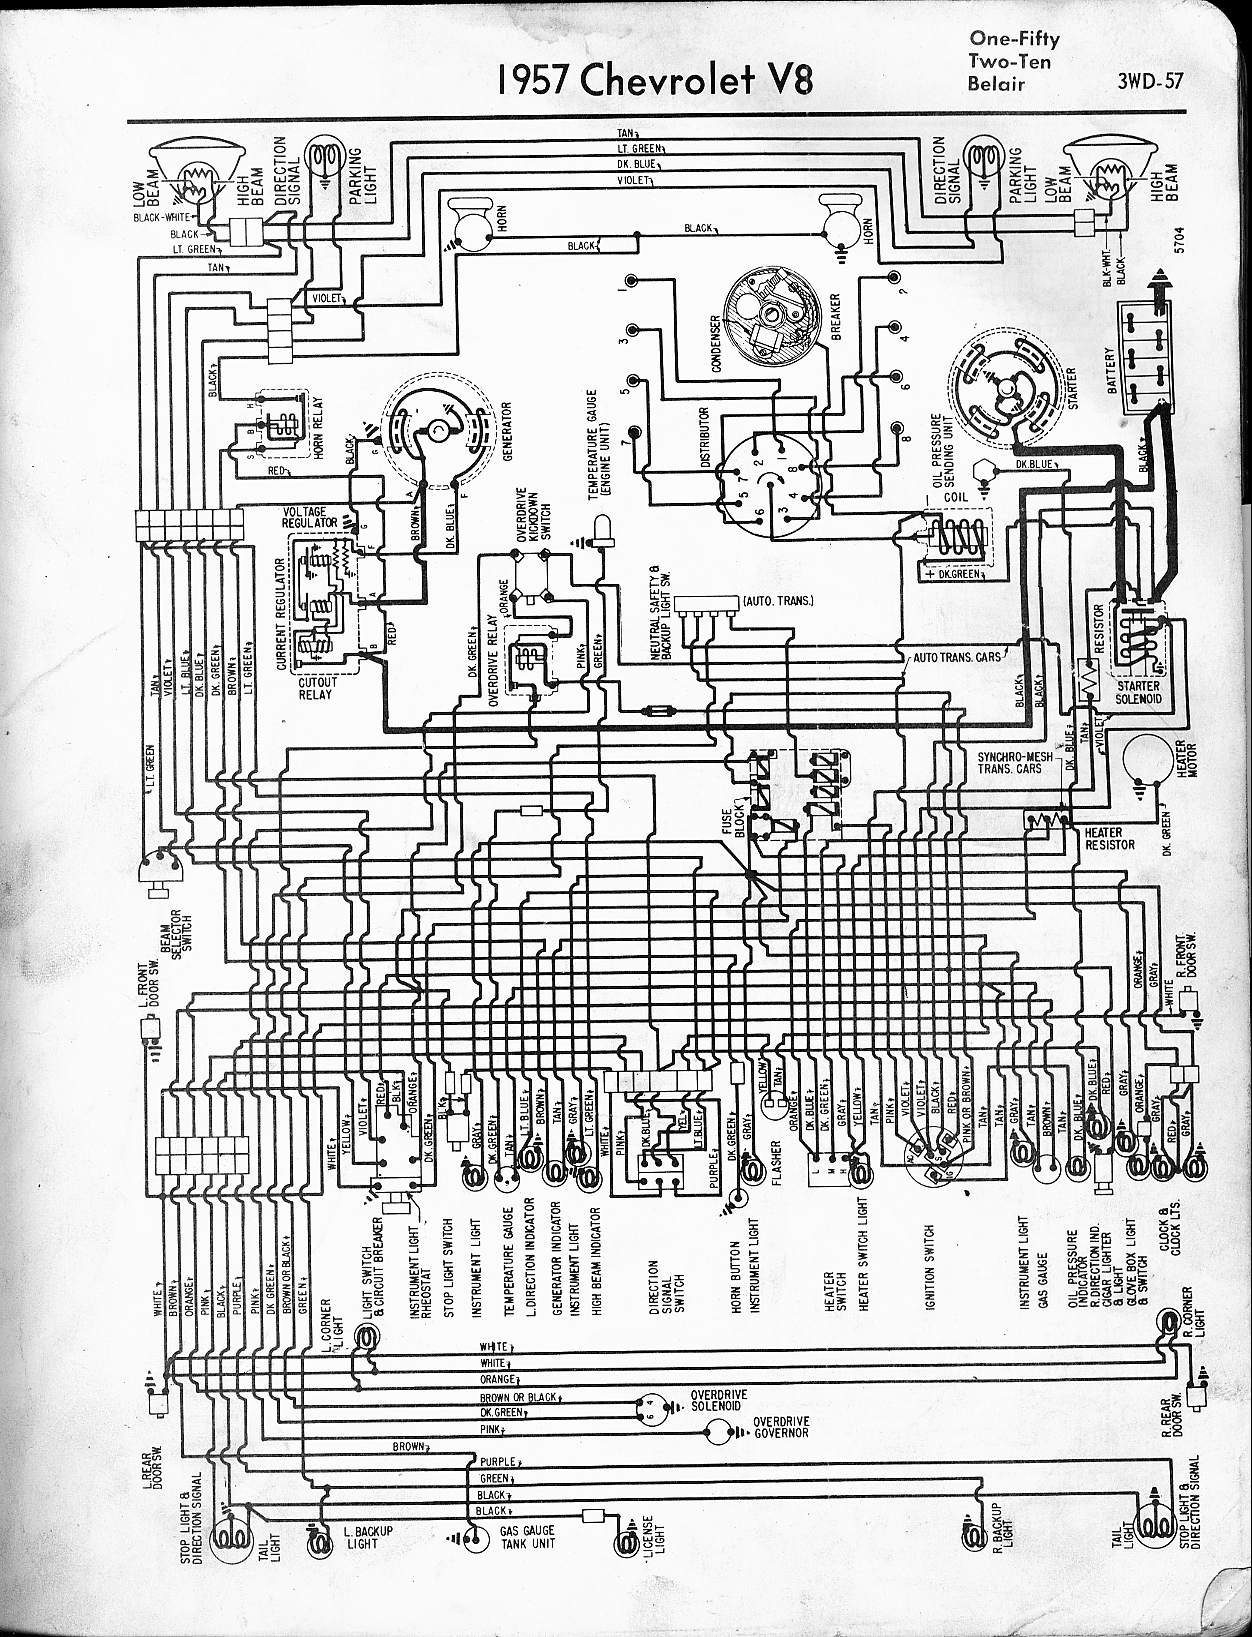 Outstanding 1997 Daewoo Cielo Wiring Diagram Basic Electronics Wiring Diagram Wiring Cloud Genionhyedimohammedshrineorg